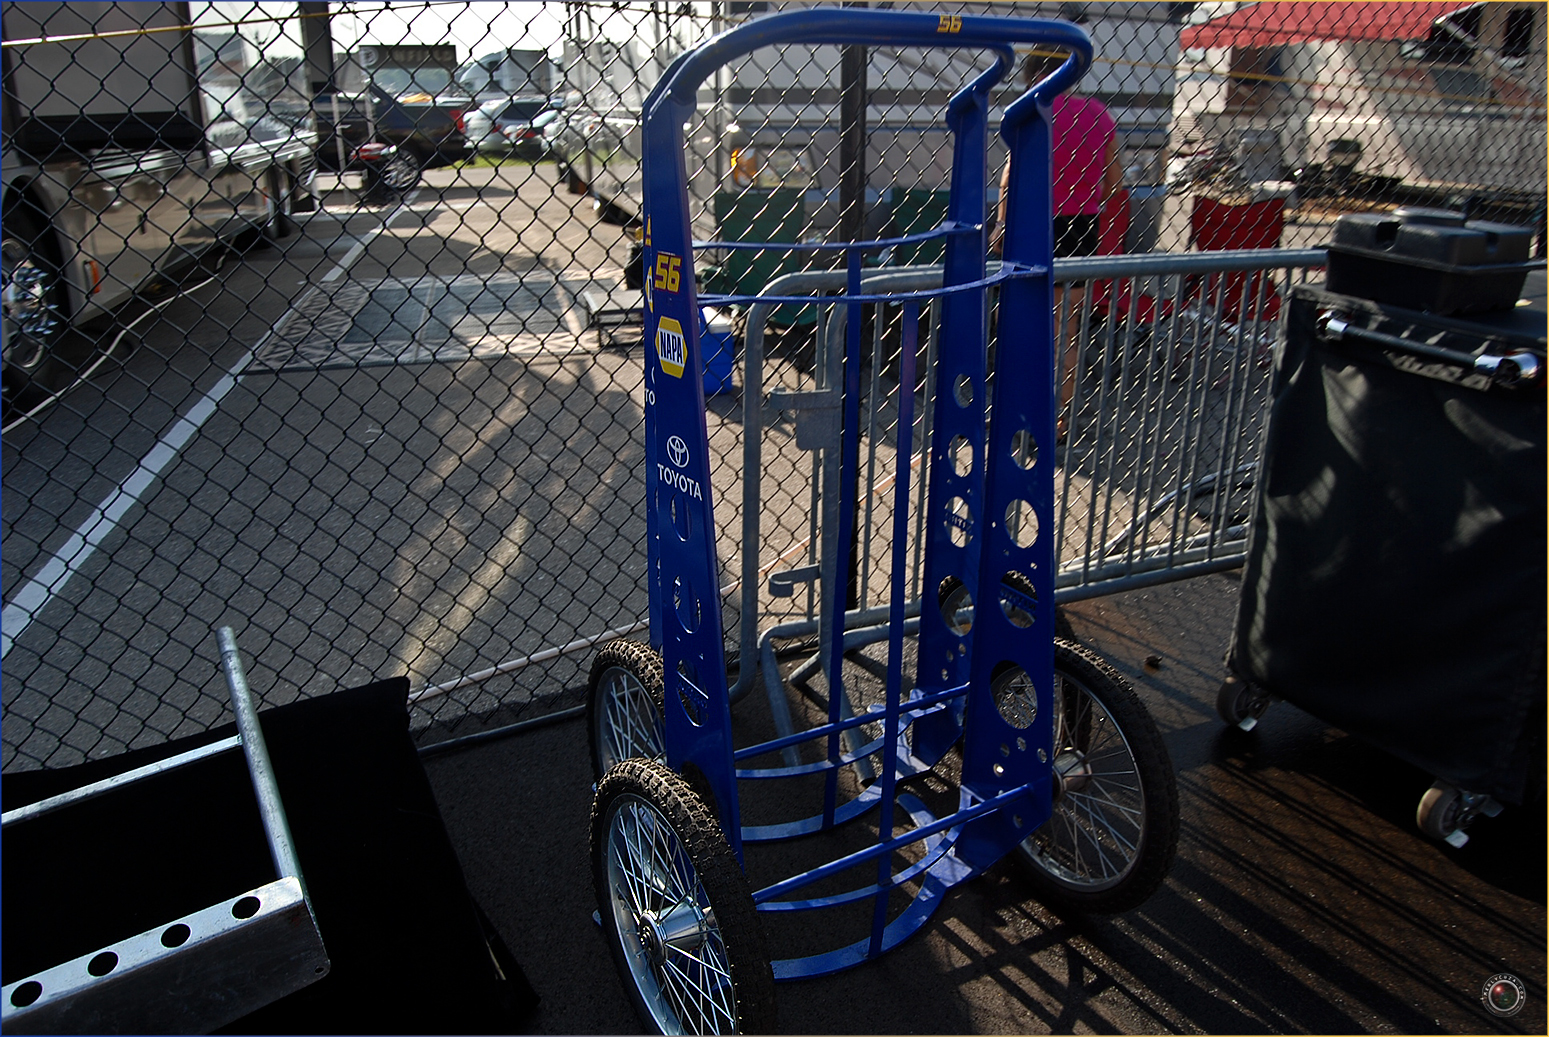 56 Nascar Tire Hand Cart